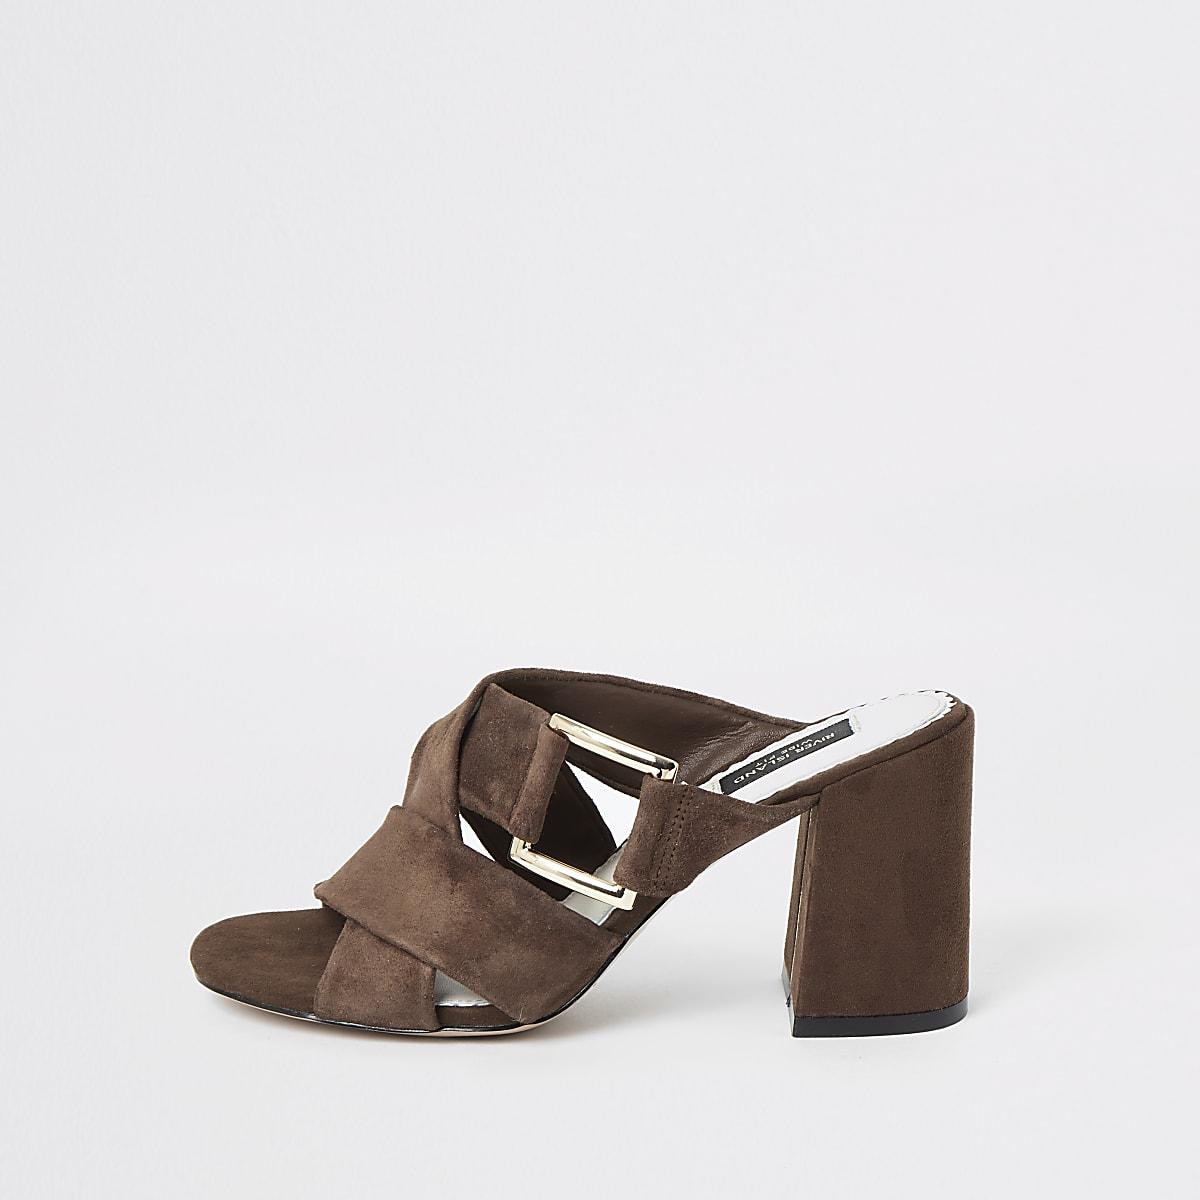 Bruine suède sandalen met brede pasvorm